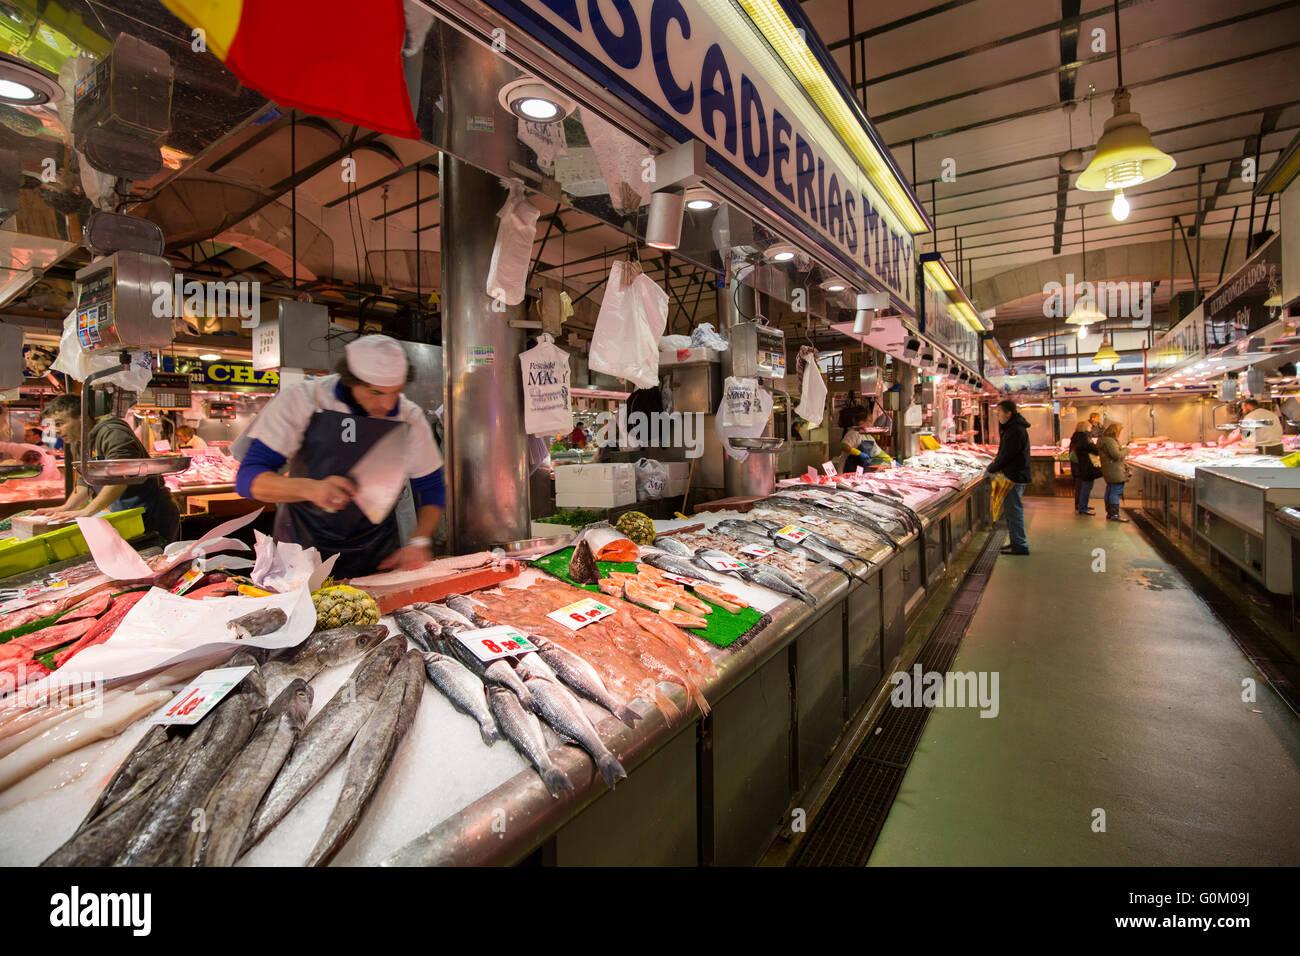 La esperanza fish market fish stall santander cantabria for La fish market